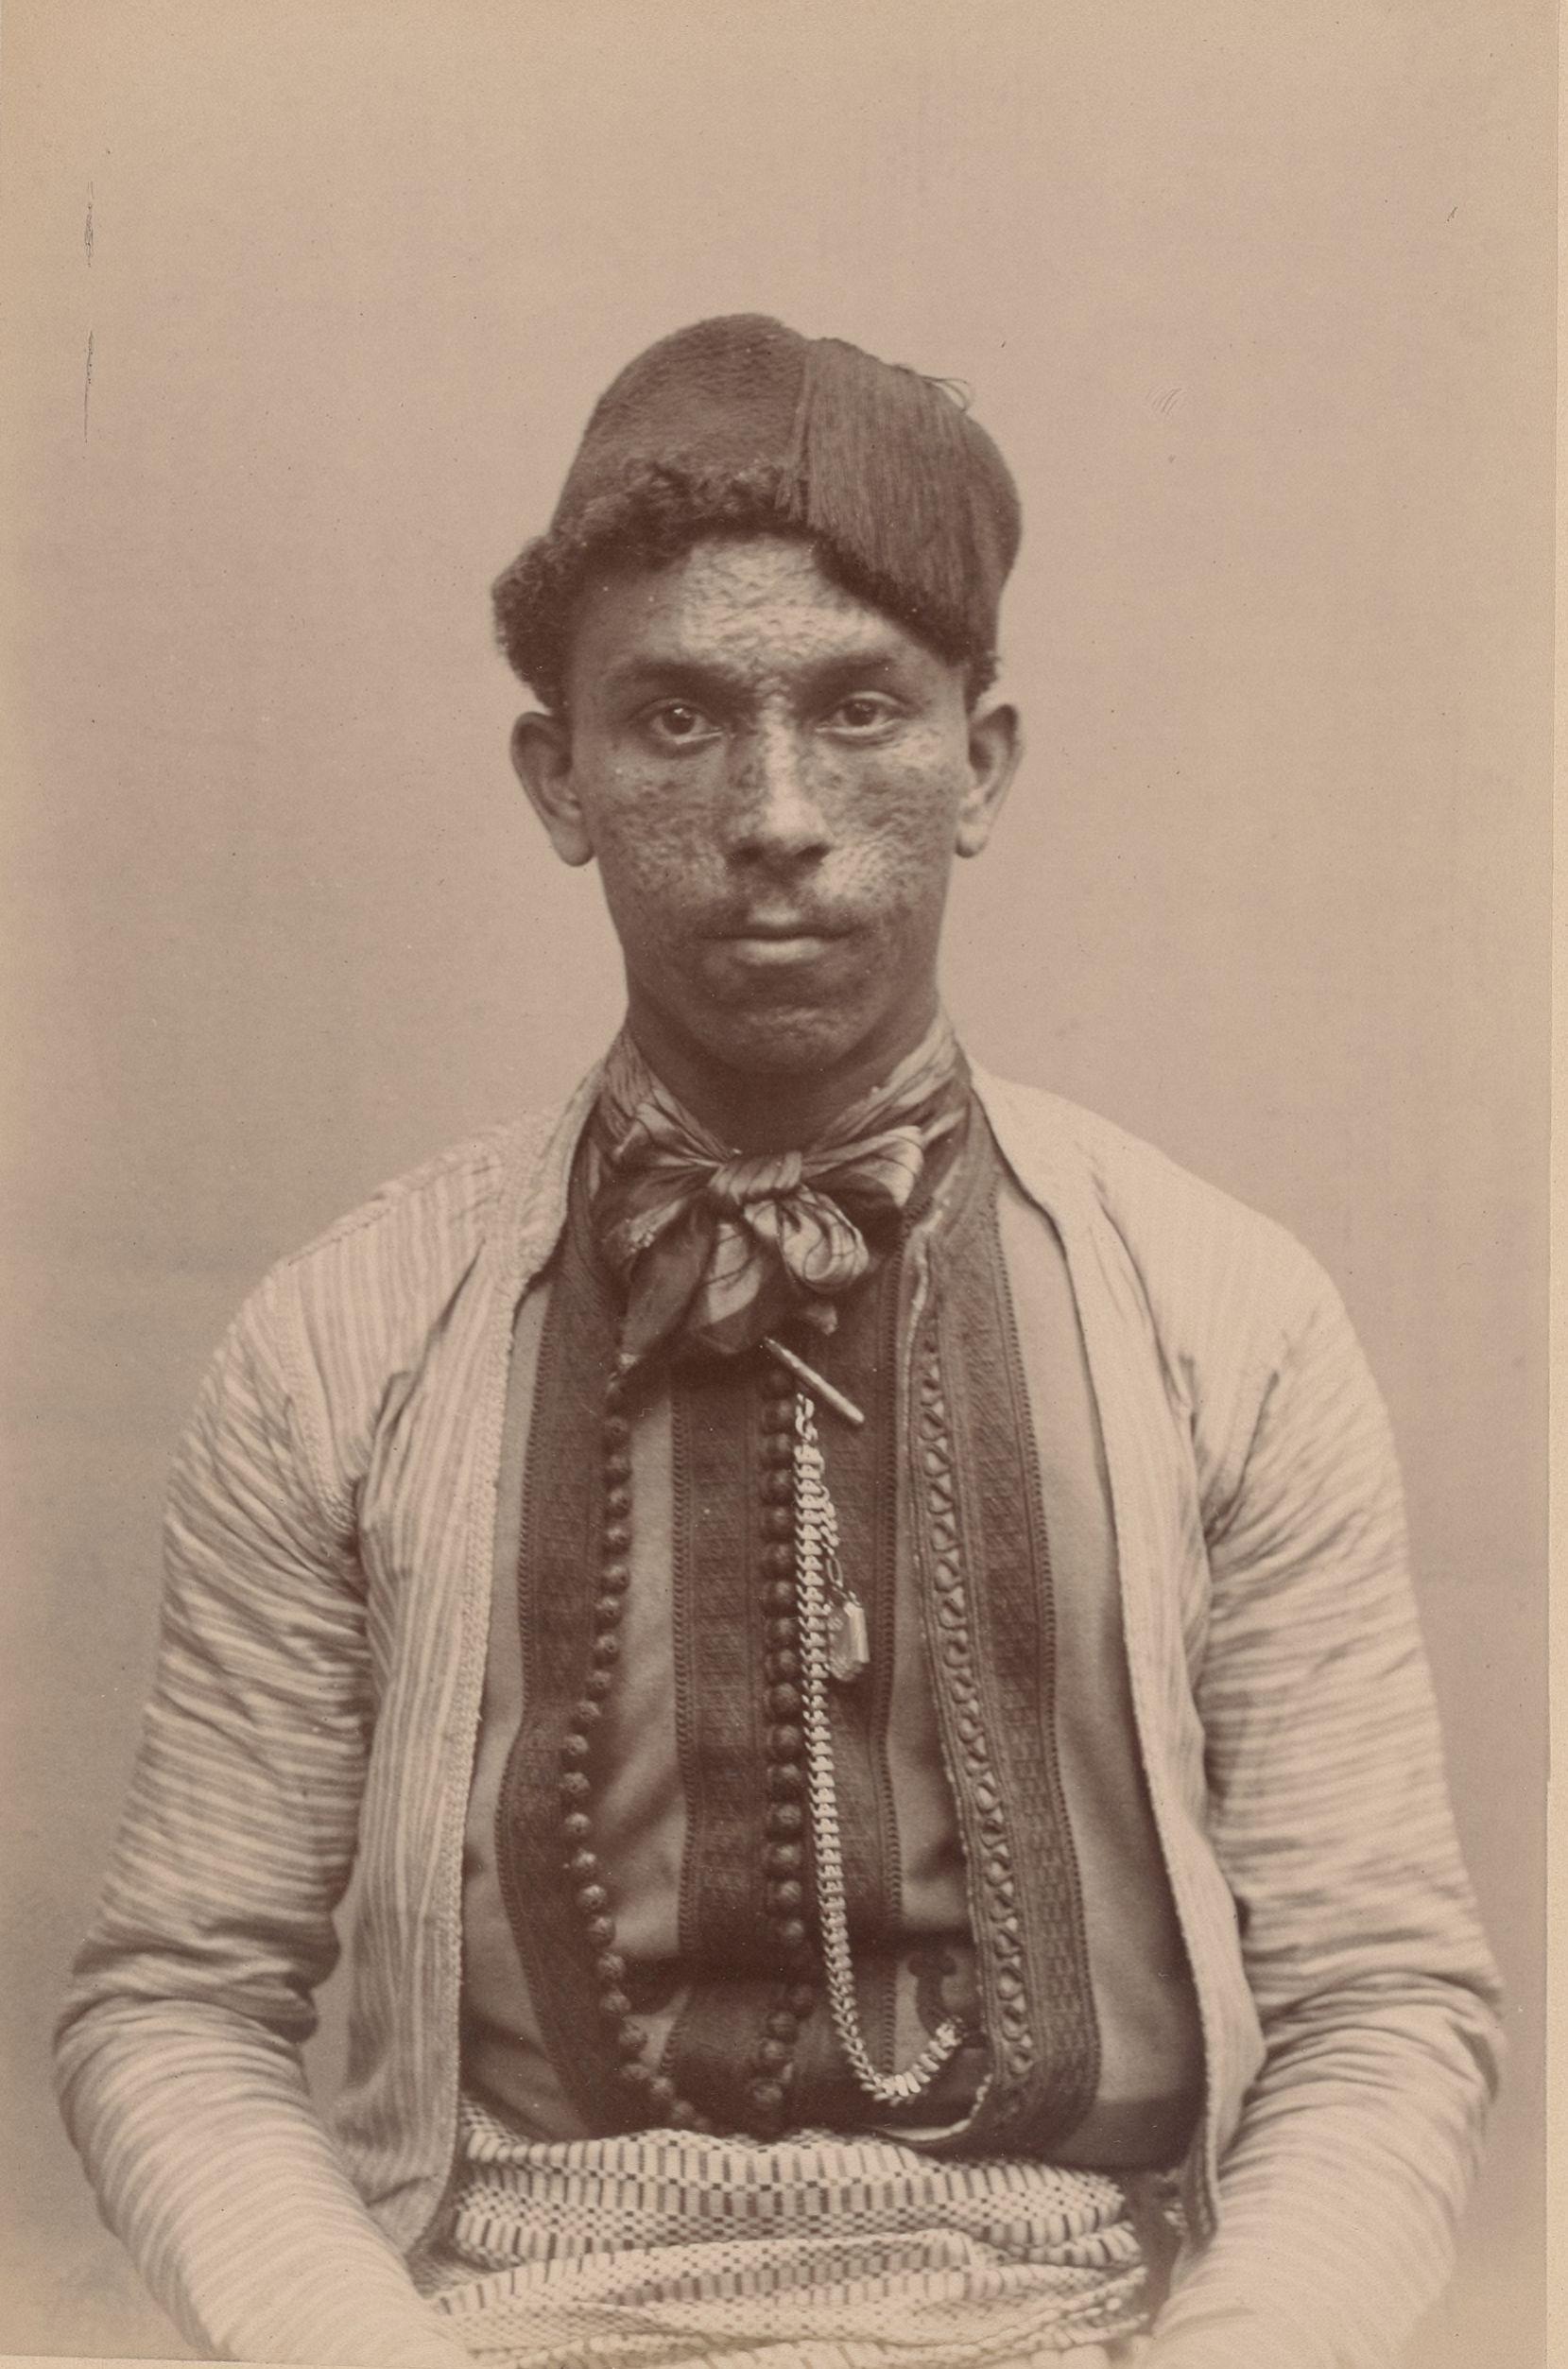 Бассар 24 года, Алжир. (Айссауа). Позументщик (вид спереди)